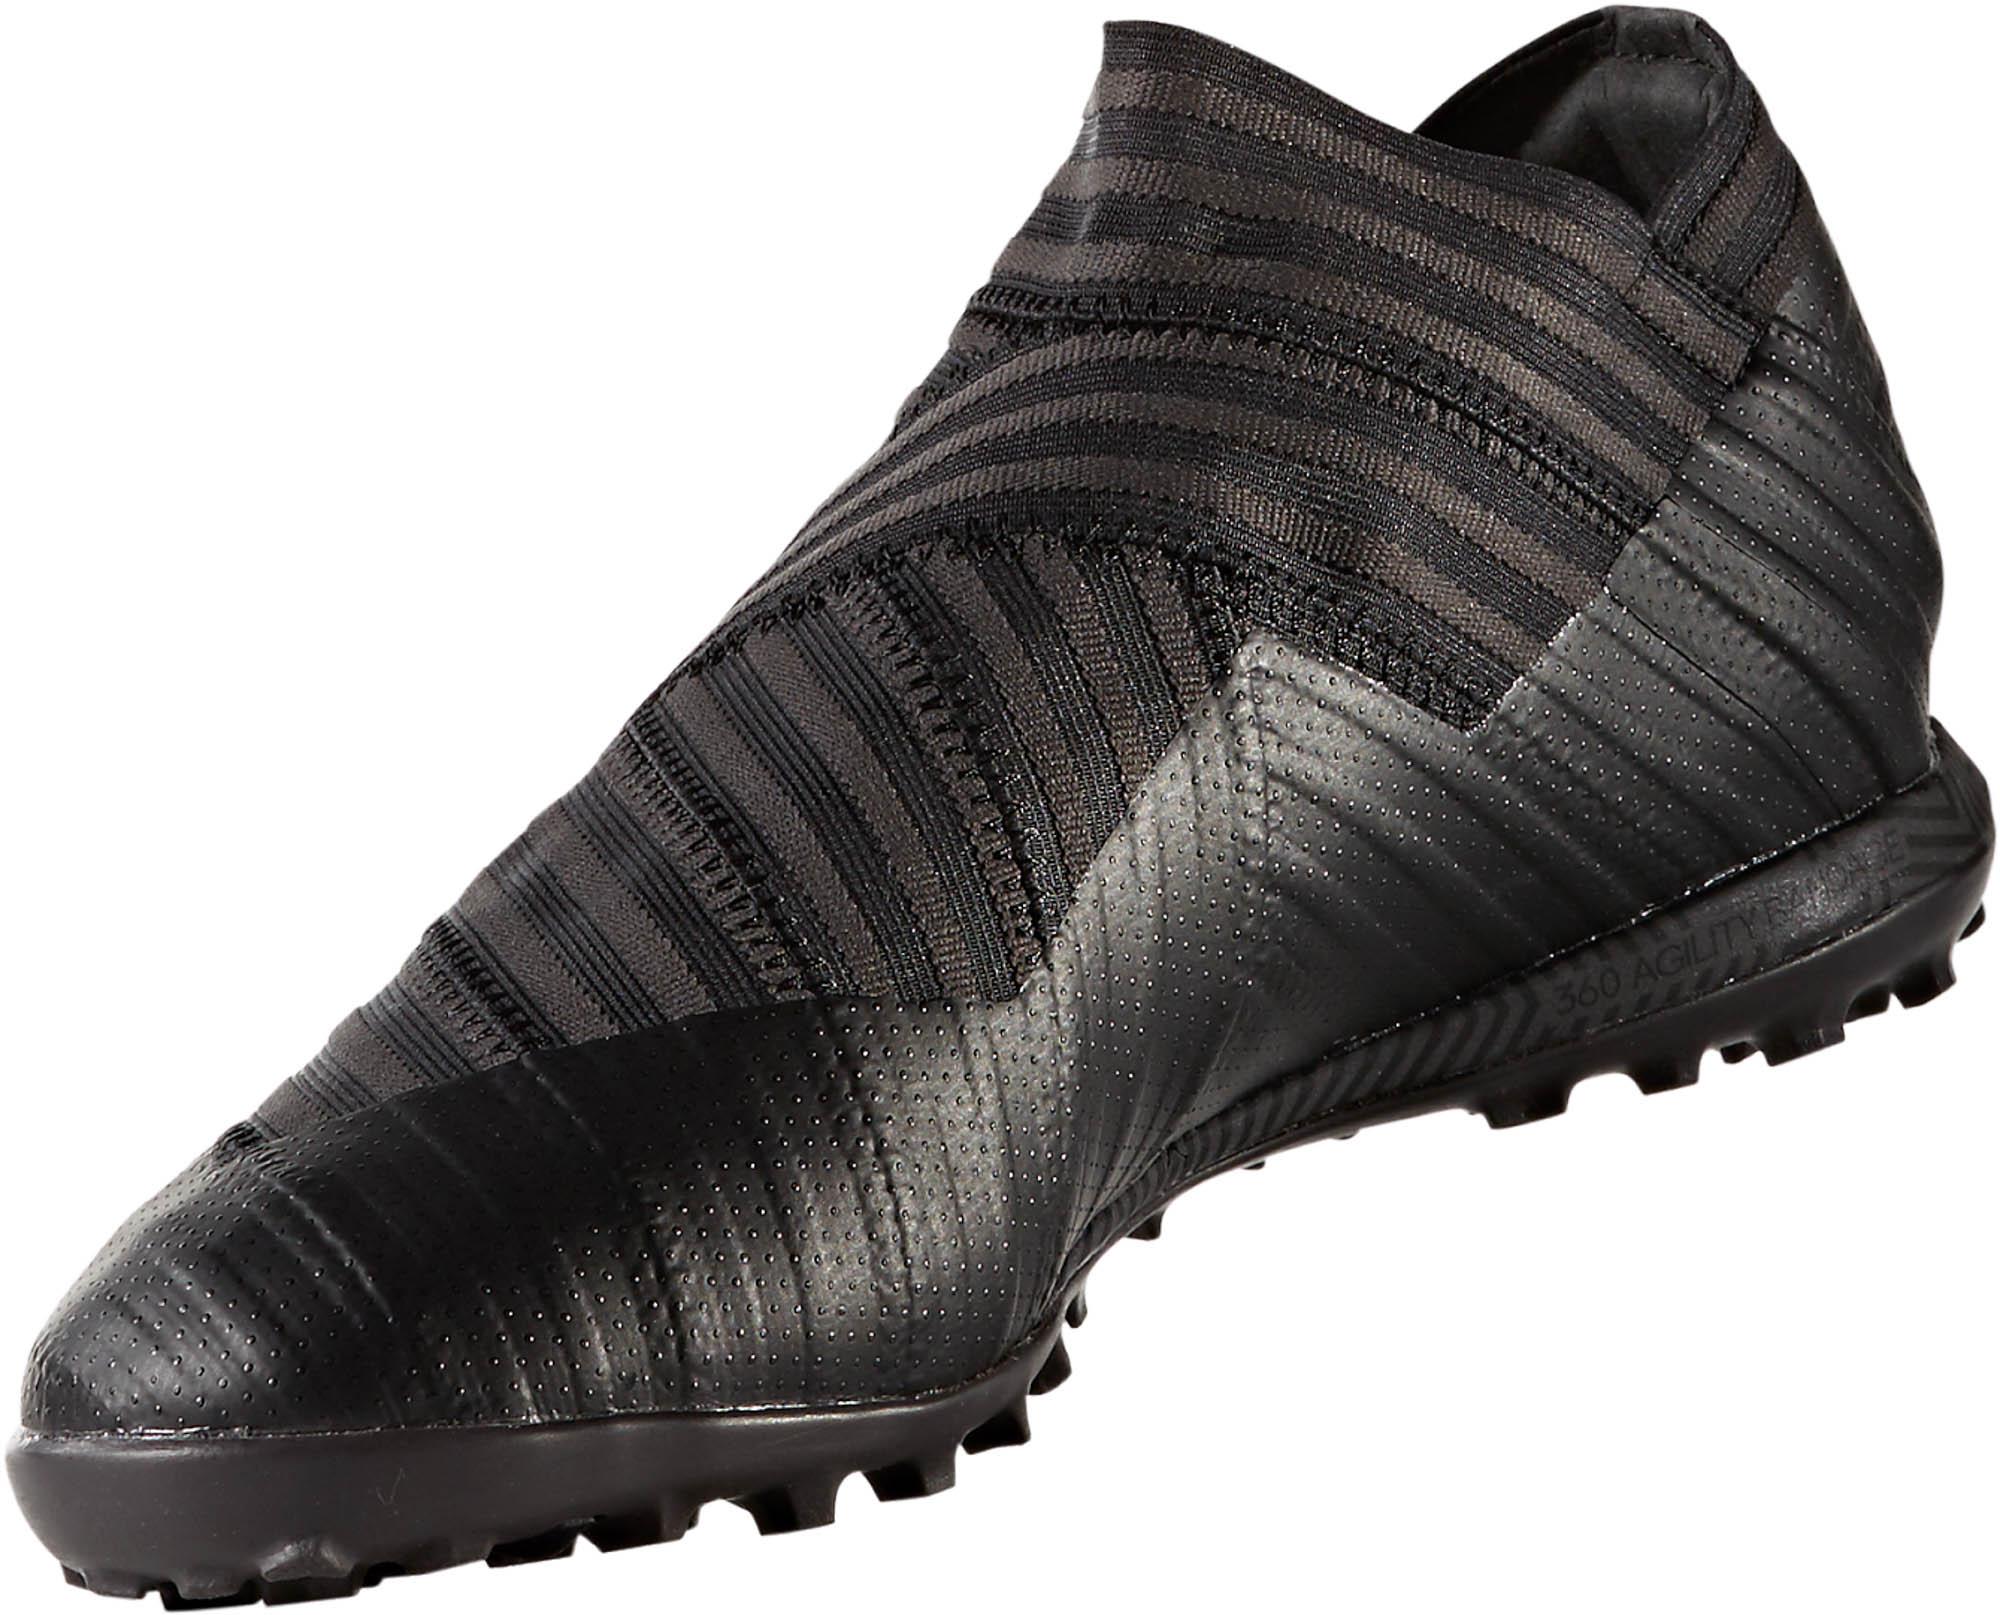 4dde04bde0a1e adidas Nemeziz Tango 17+ 360Agility - Black   Utility Black - Soccer ...